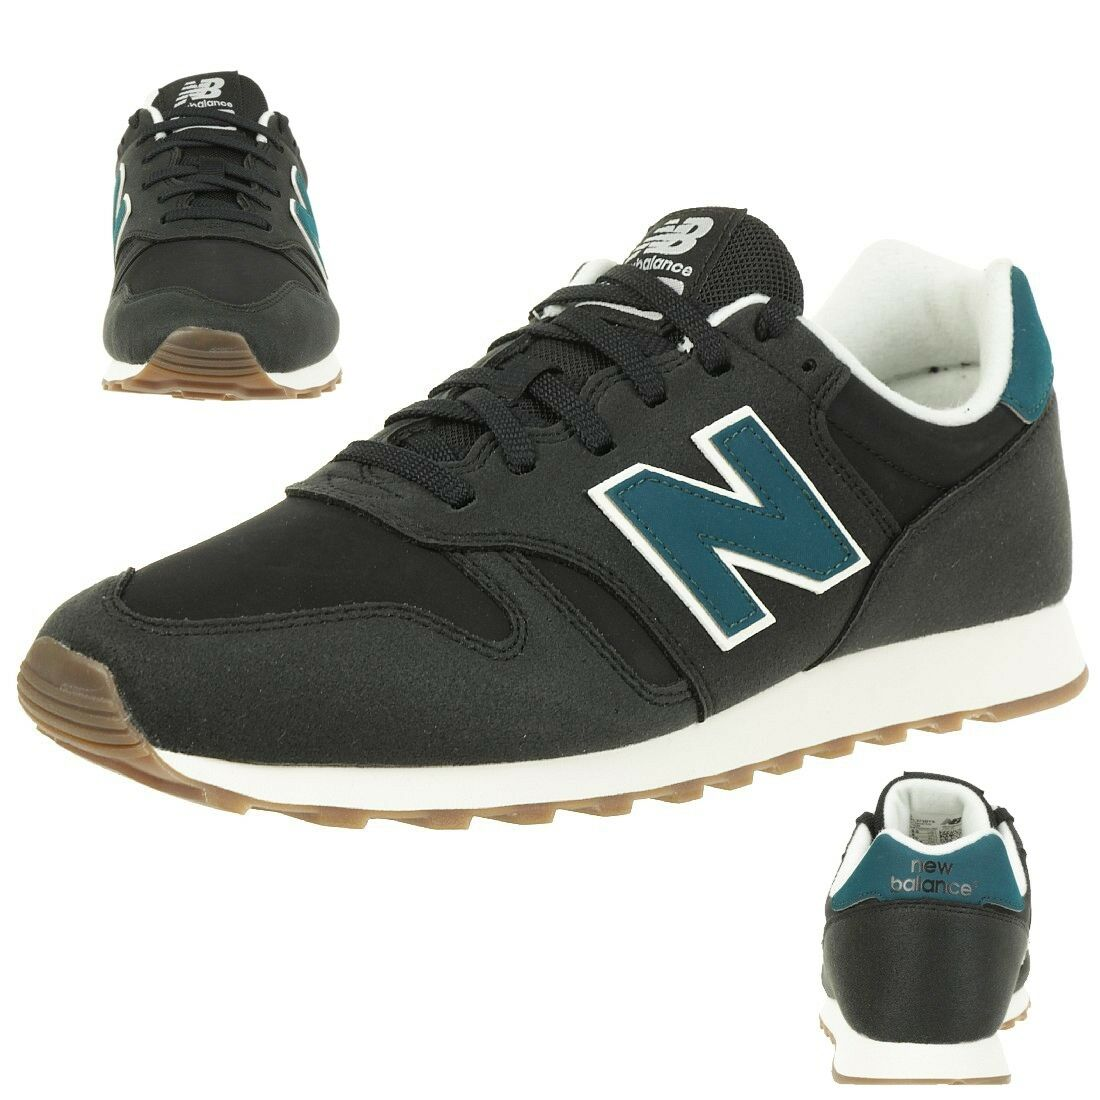 New Balance ML373BYS Classic Sneaker Herren Schuhe schwarz 373